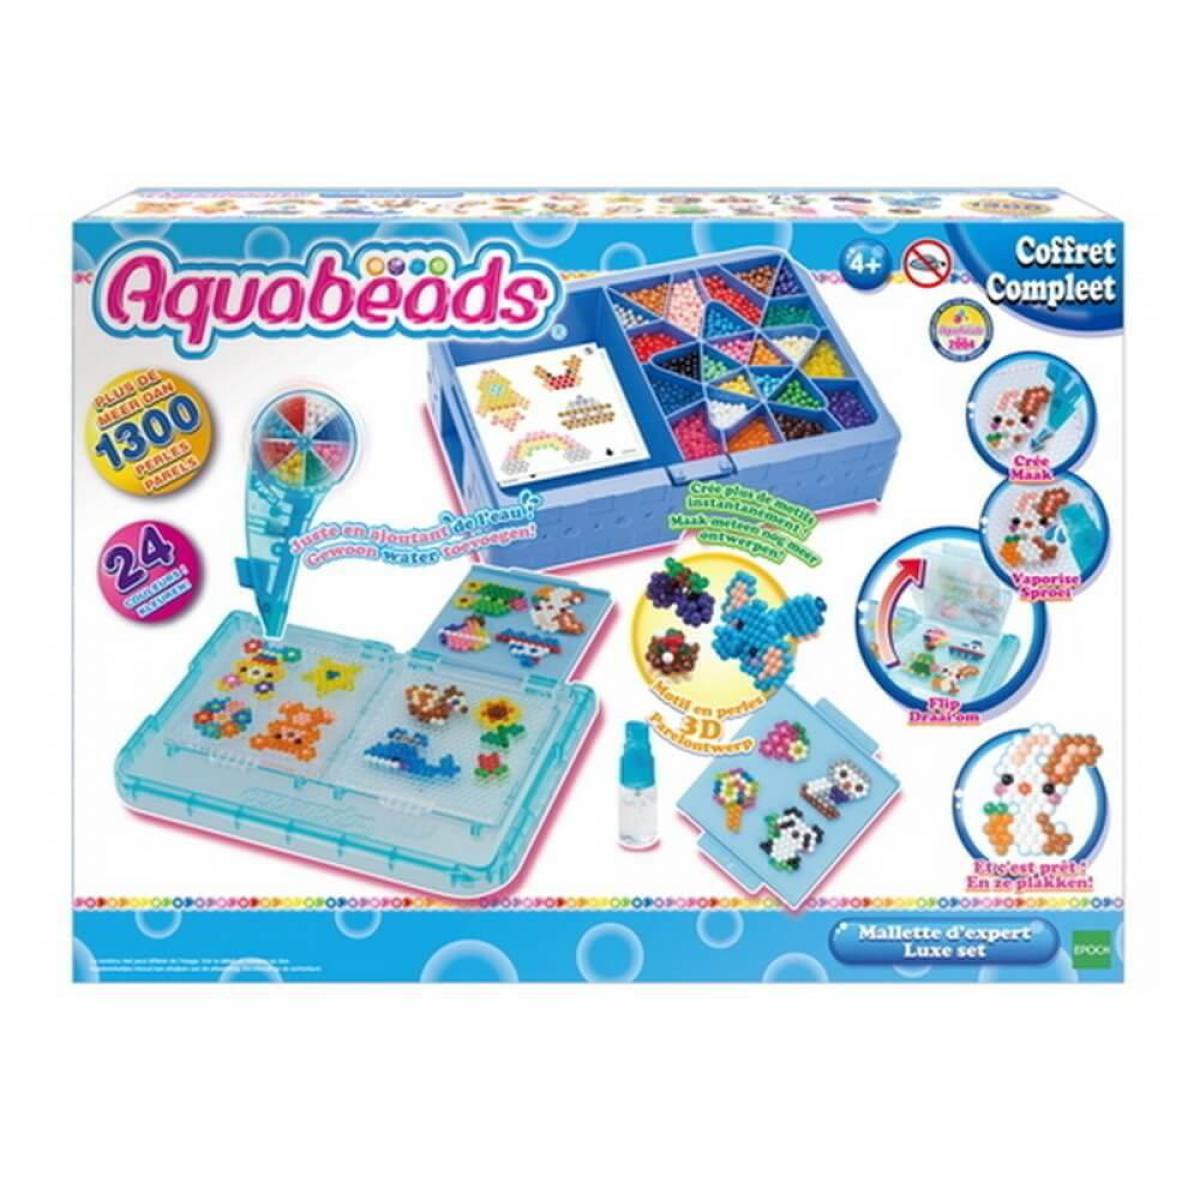 Aquabeads Perles Aquabeads : La mallett